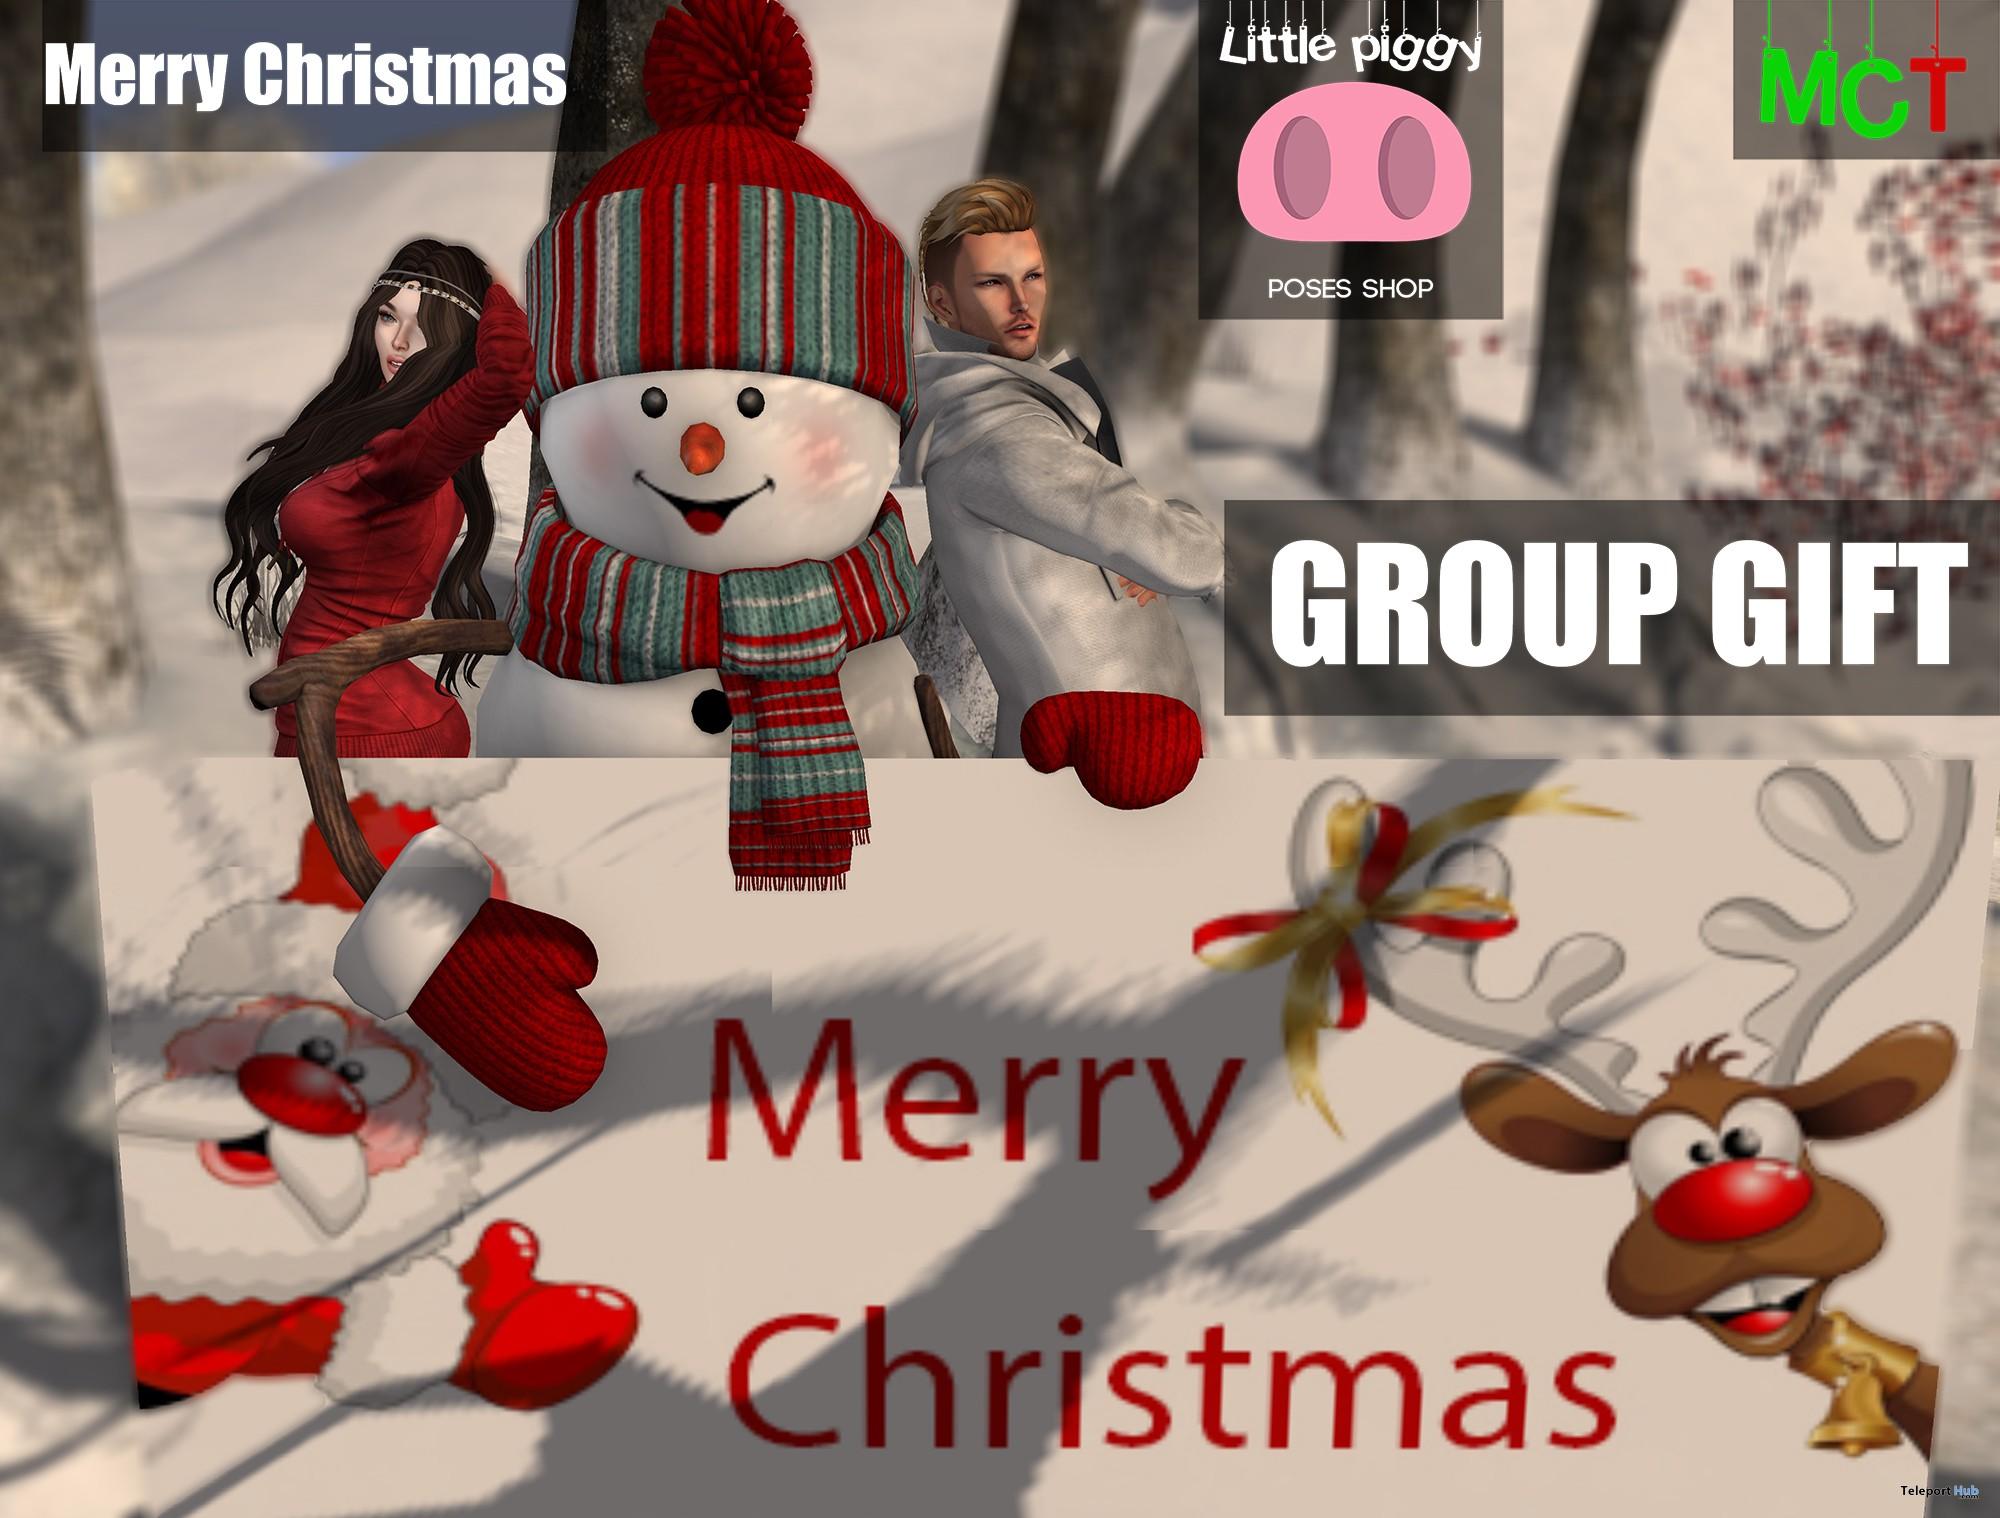 Merry Christmas Pose by Little Piggy - Teleport Hub - teleporthub.com